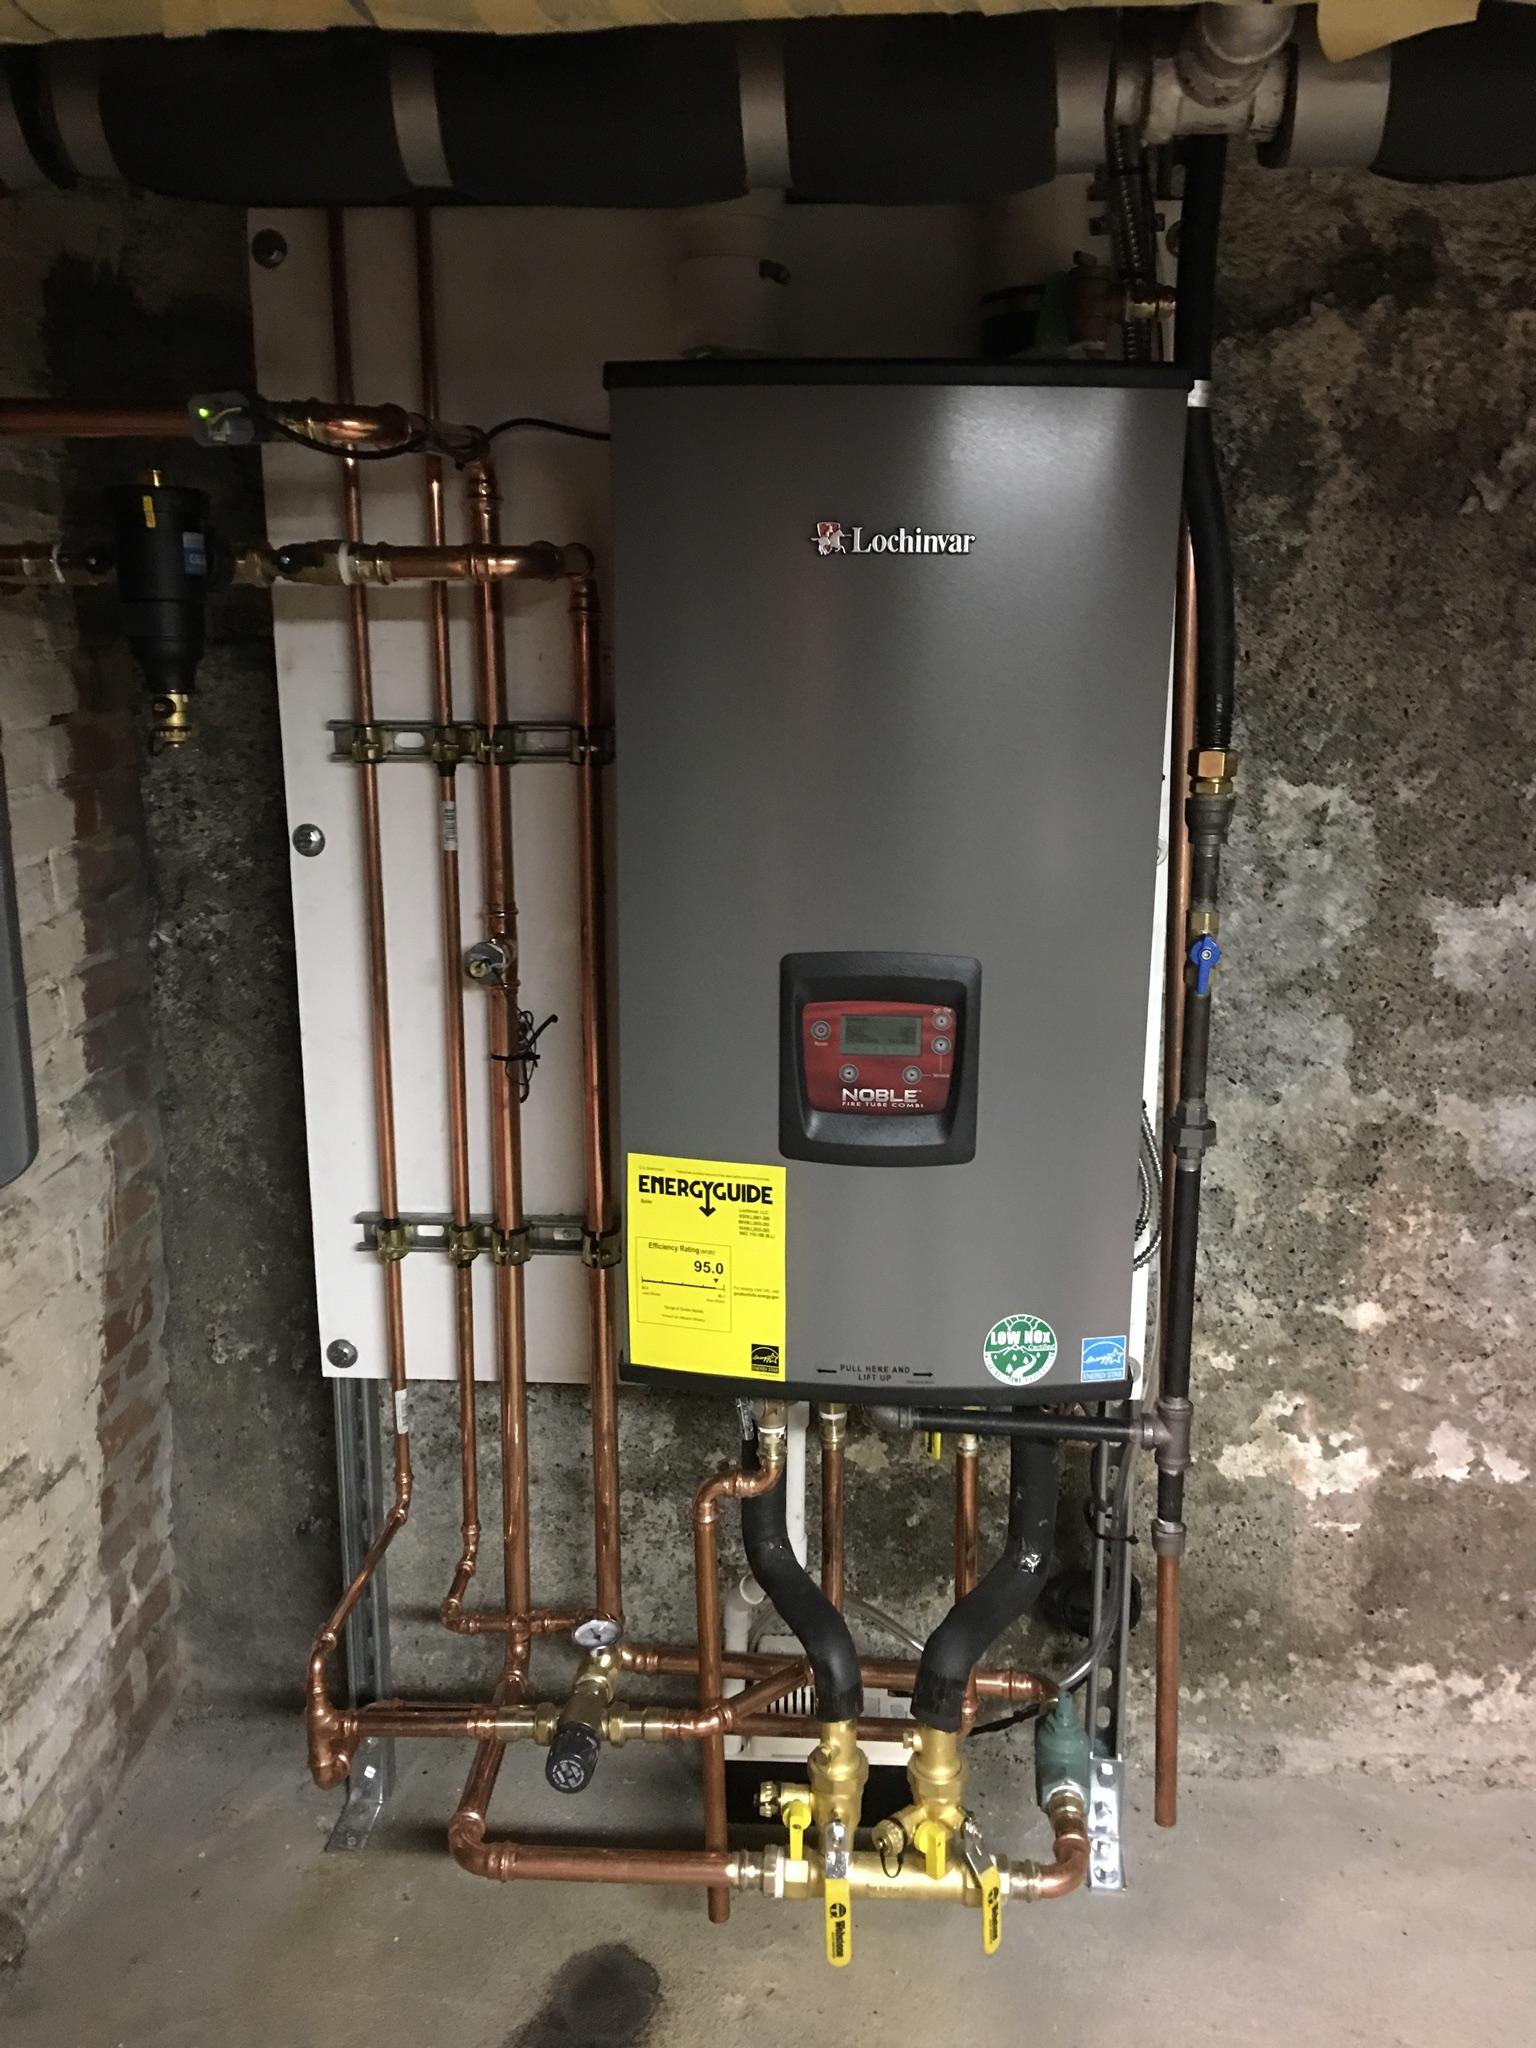 Lochinvar Noble  U2014 Heating Help  The Wall